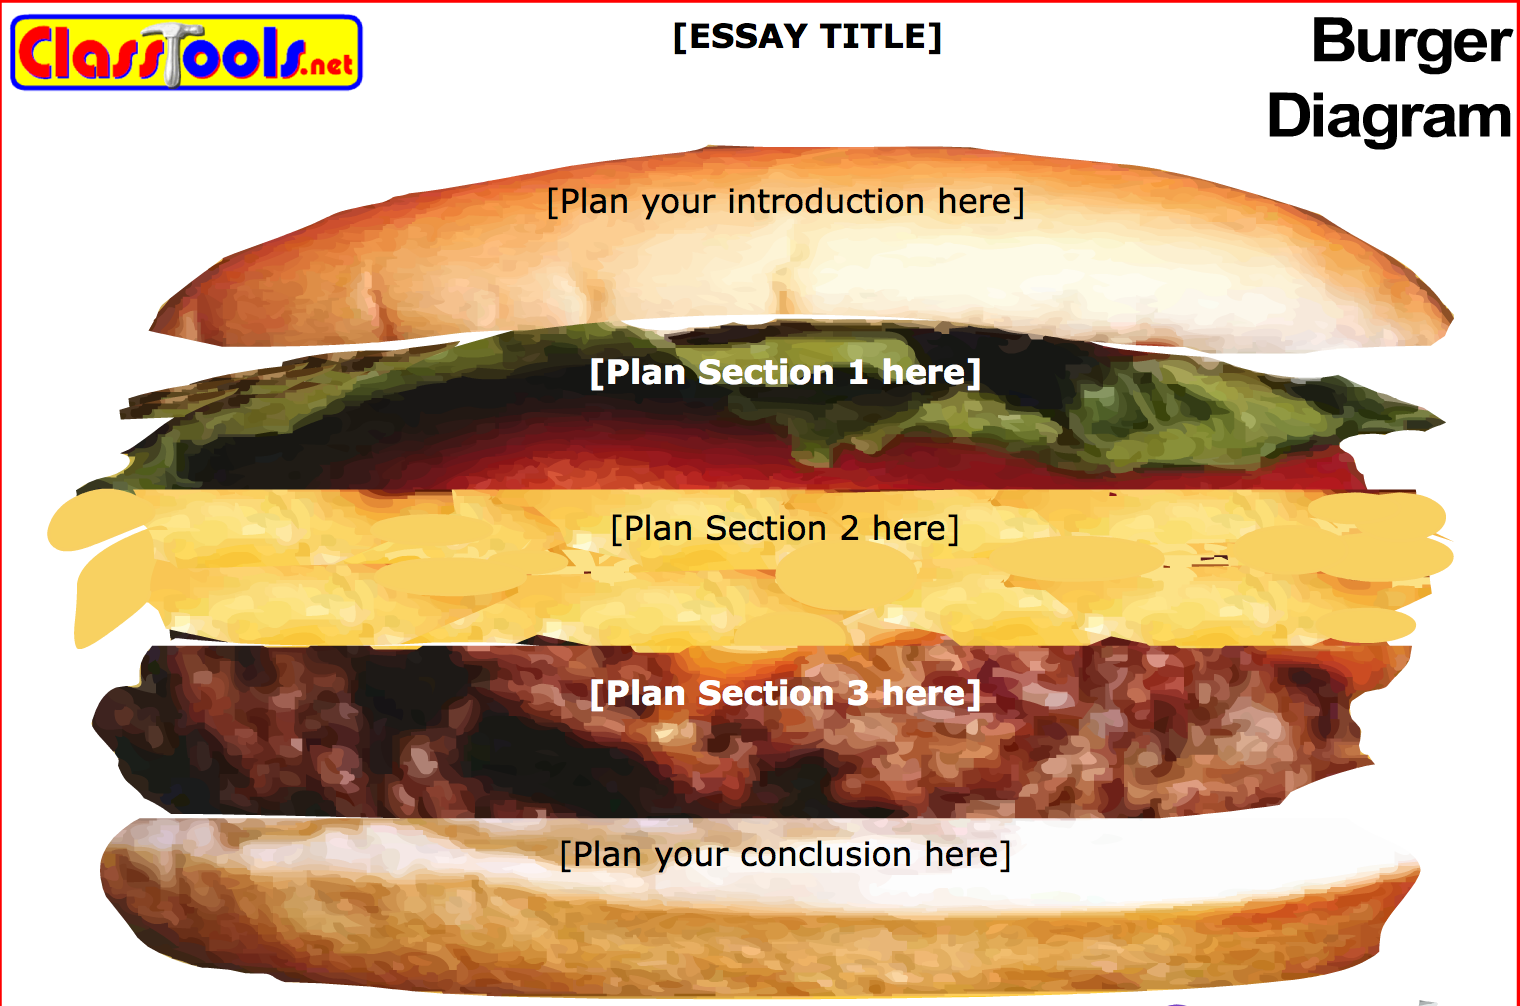 Essay Writing Sandwich Diagram Wiring 12v Caravan Fridge Digital Fishbone And Hamburger Paragraph